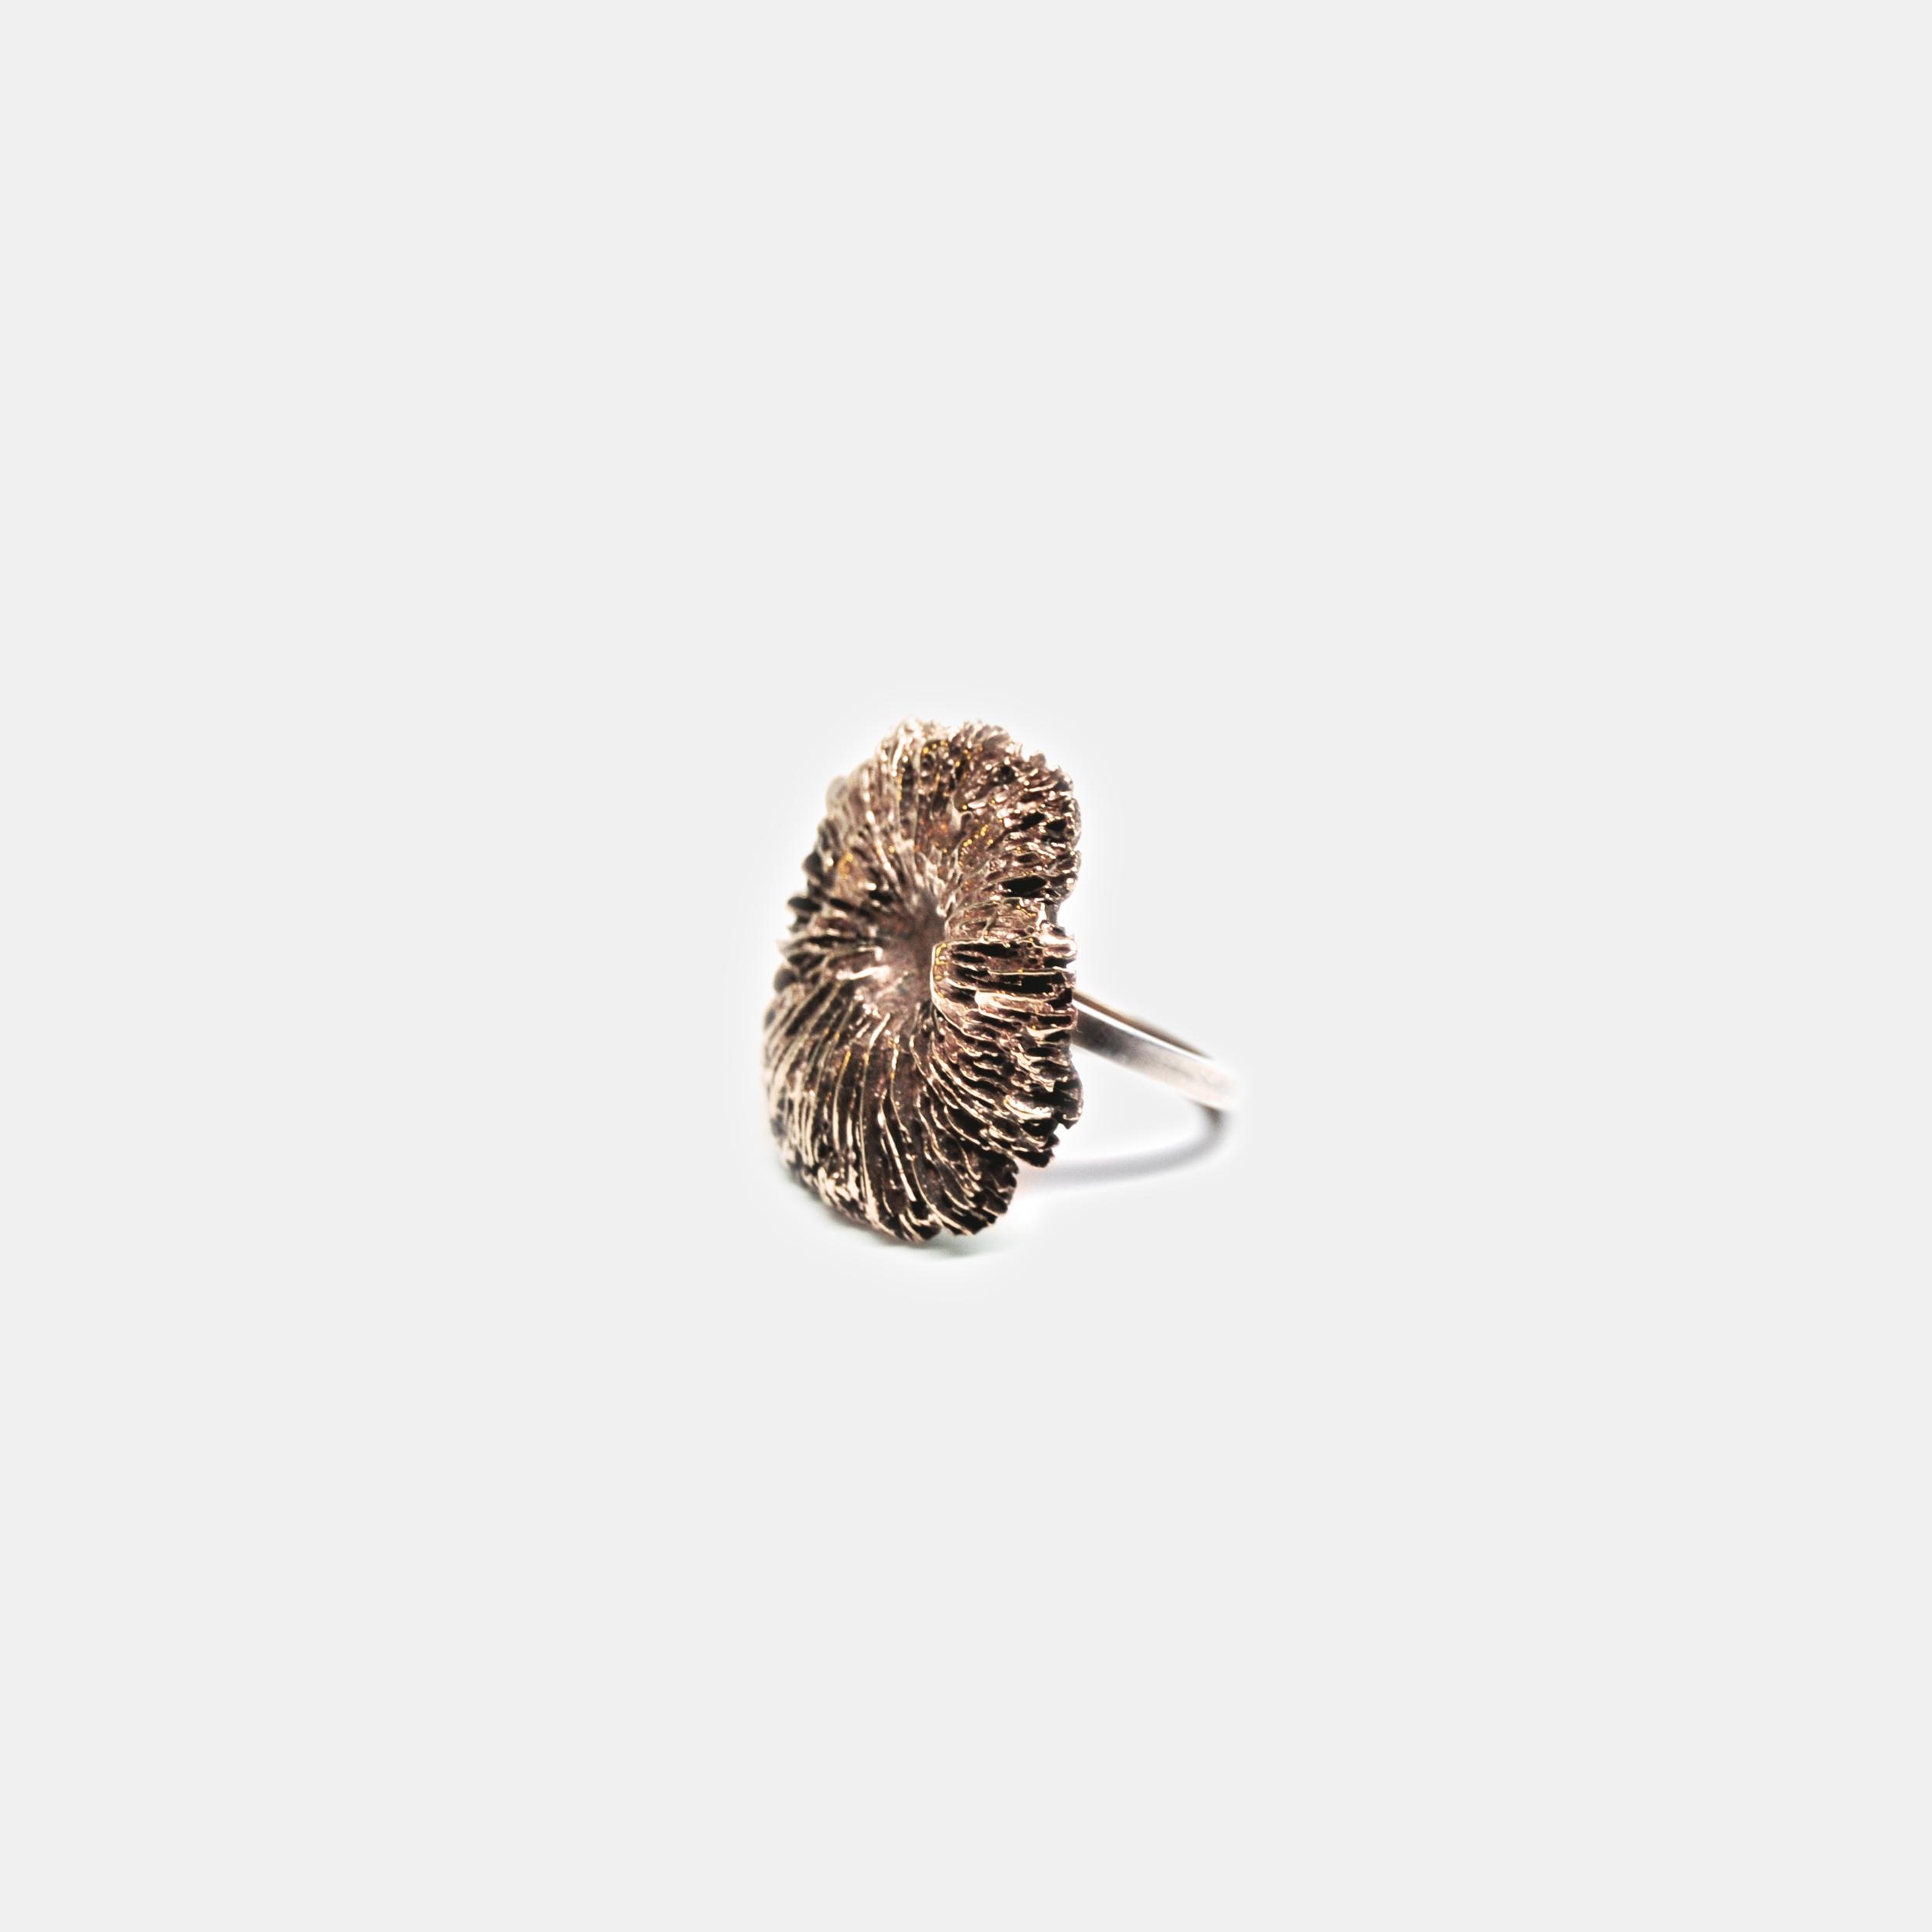 Marisa_Lomonaco_Hudson_Valley_custom_Jewelry_0006_Bronze Coral Ring.jpg